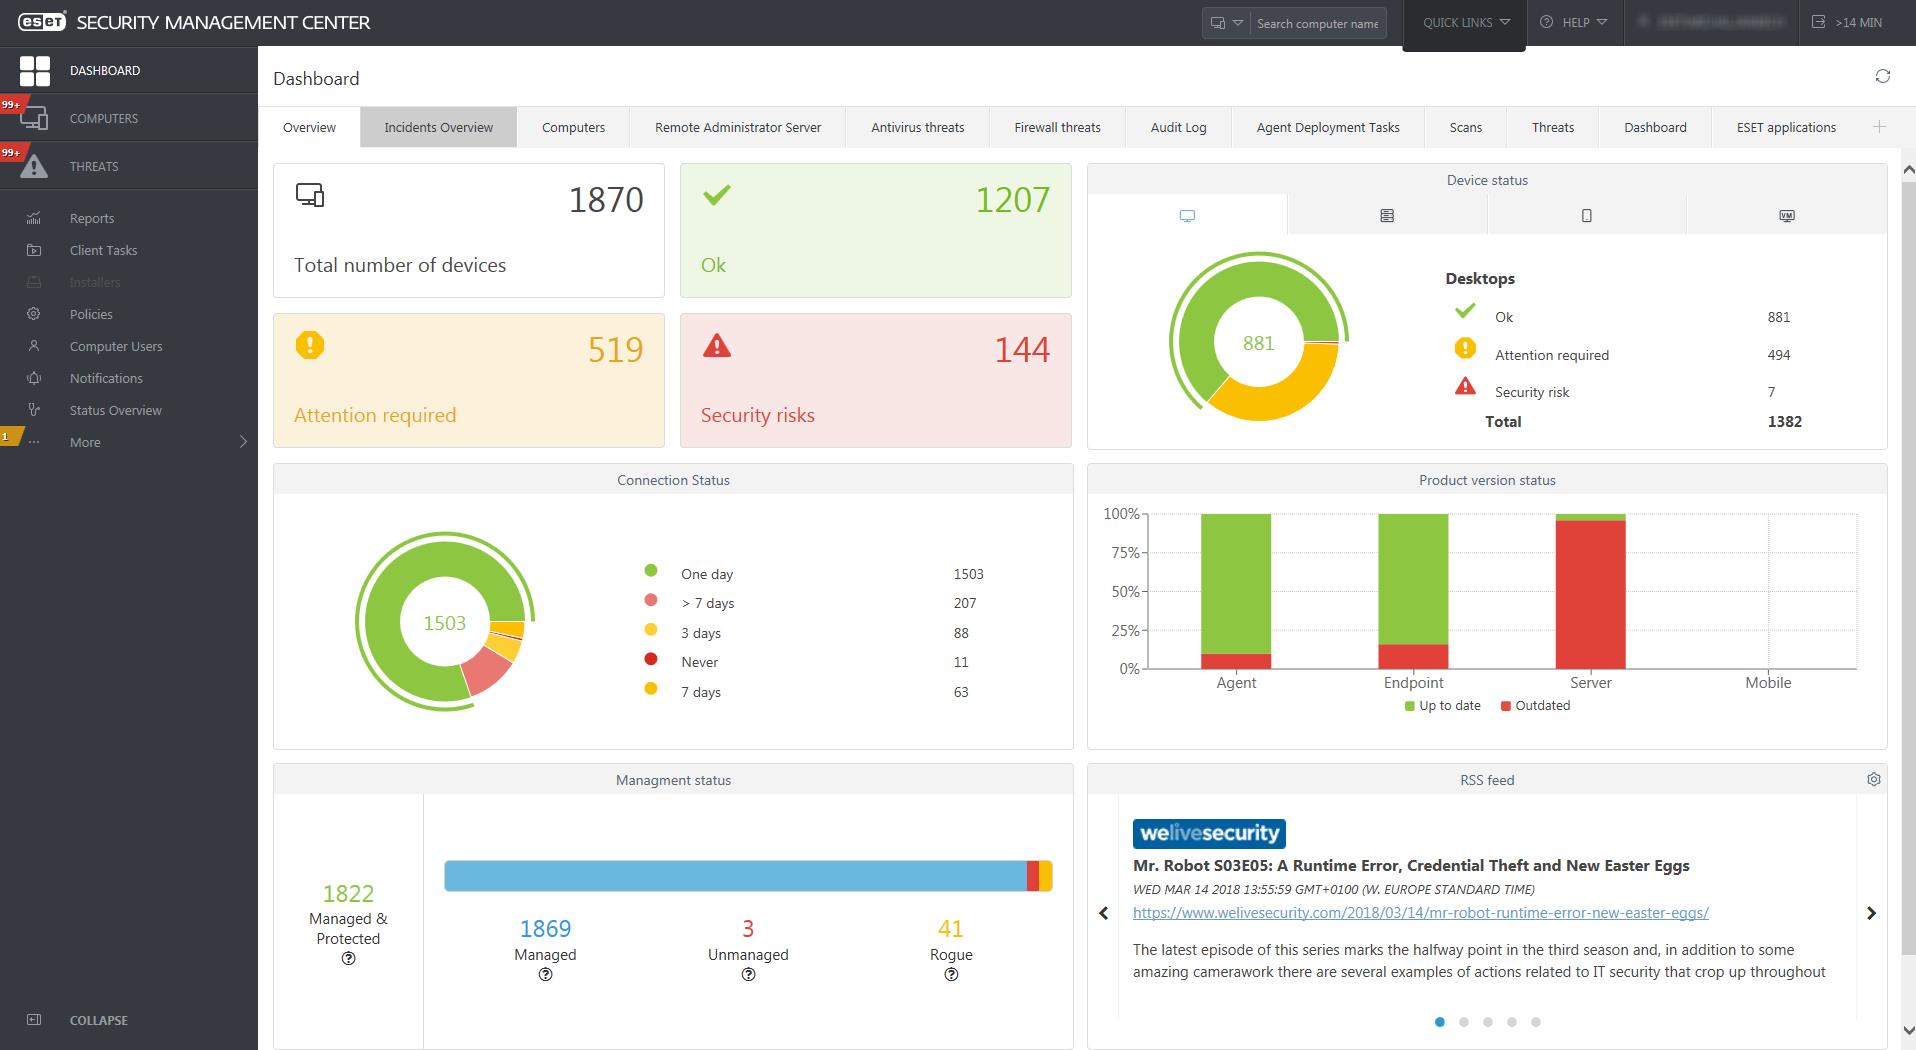 ESET Security Management Center - Dashboard/Overview